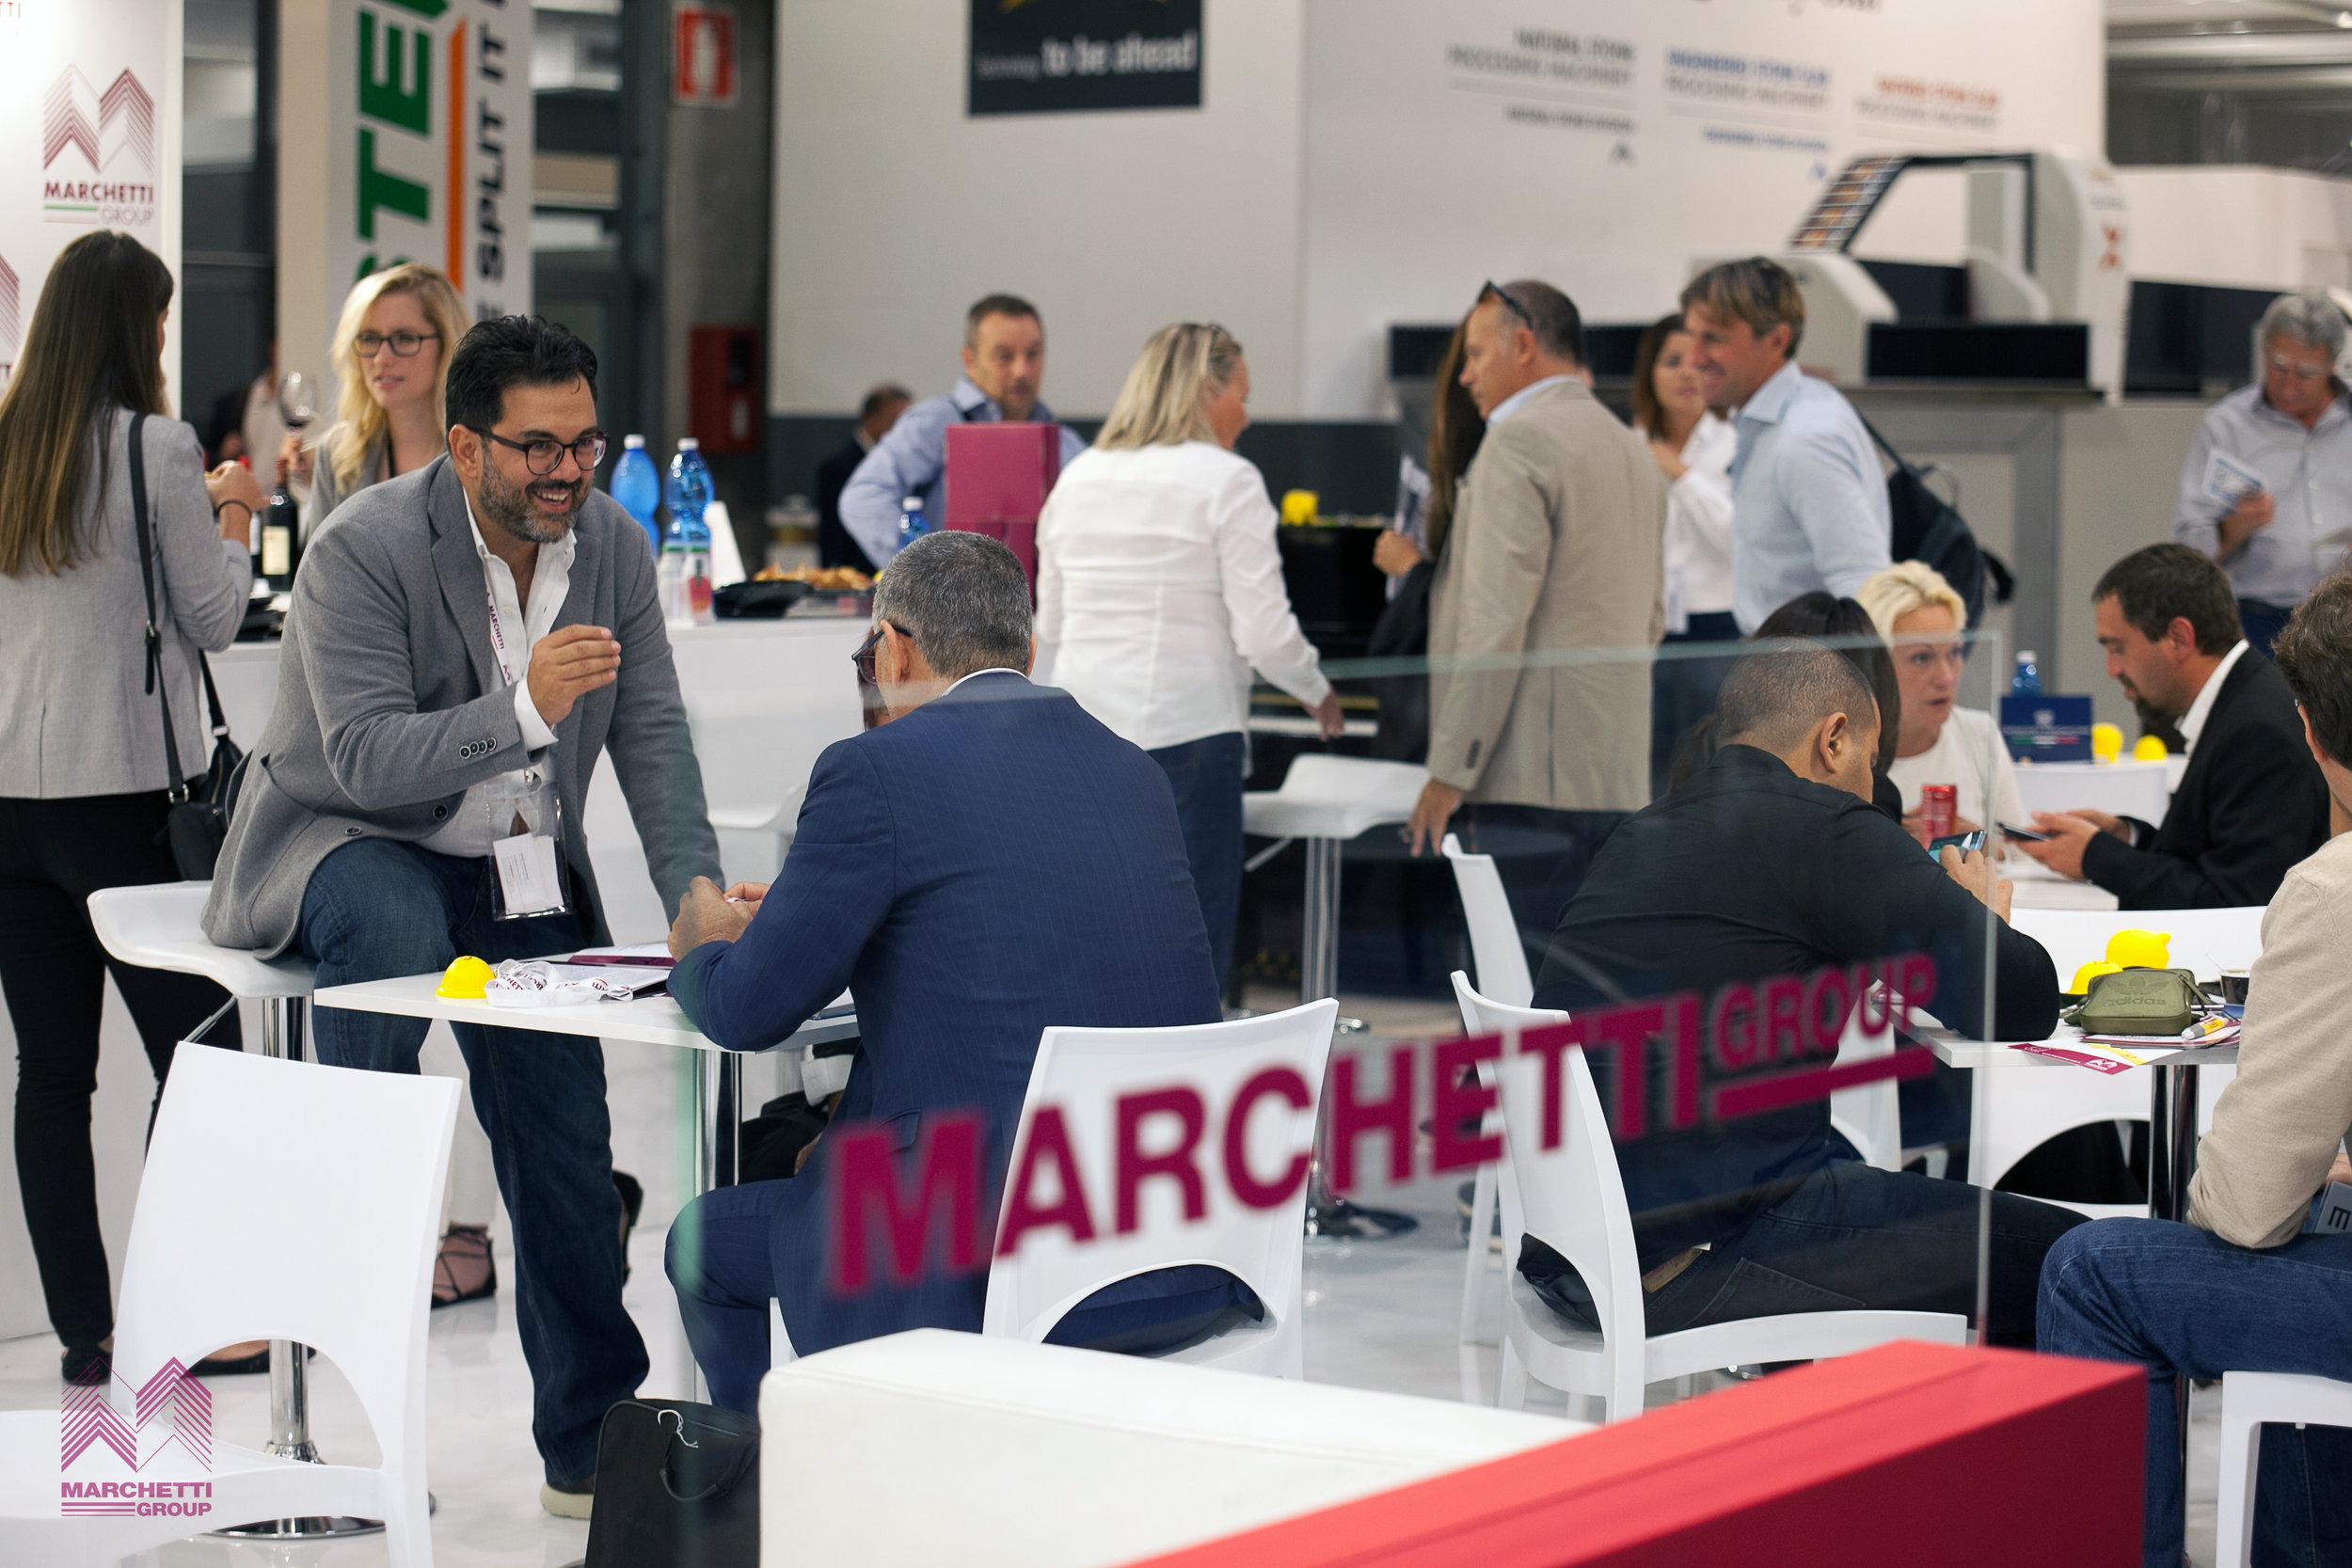 Officine Marchetti Booth at Verona Fair 2018.jpg